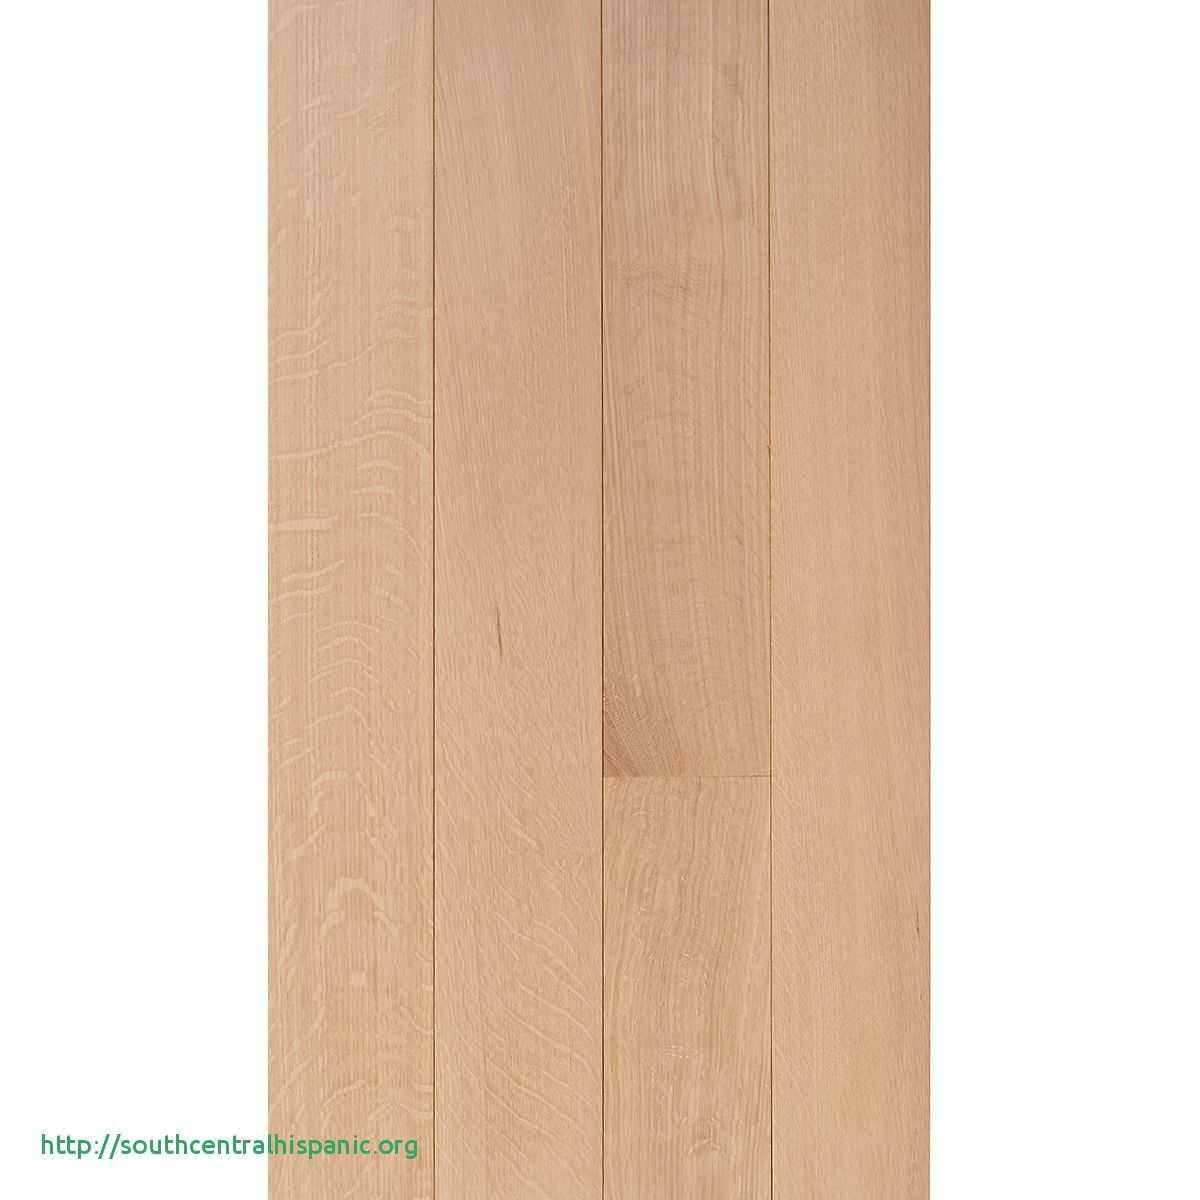 3 4 red oak hardwood flooring of 22 luxe oak floor grades ideas blog regarding hardwood flooring oak floor grades luxe quarter sawn white oak 3 4 x 5